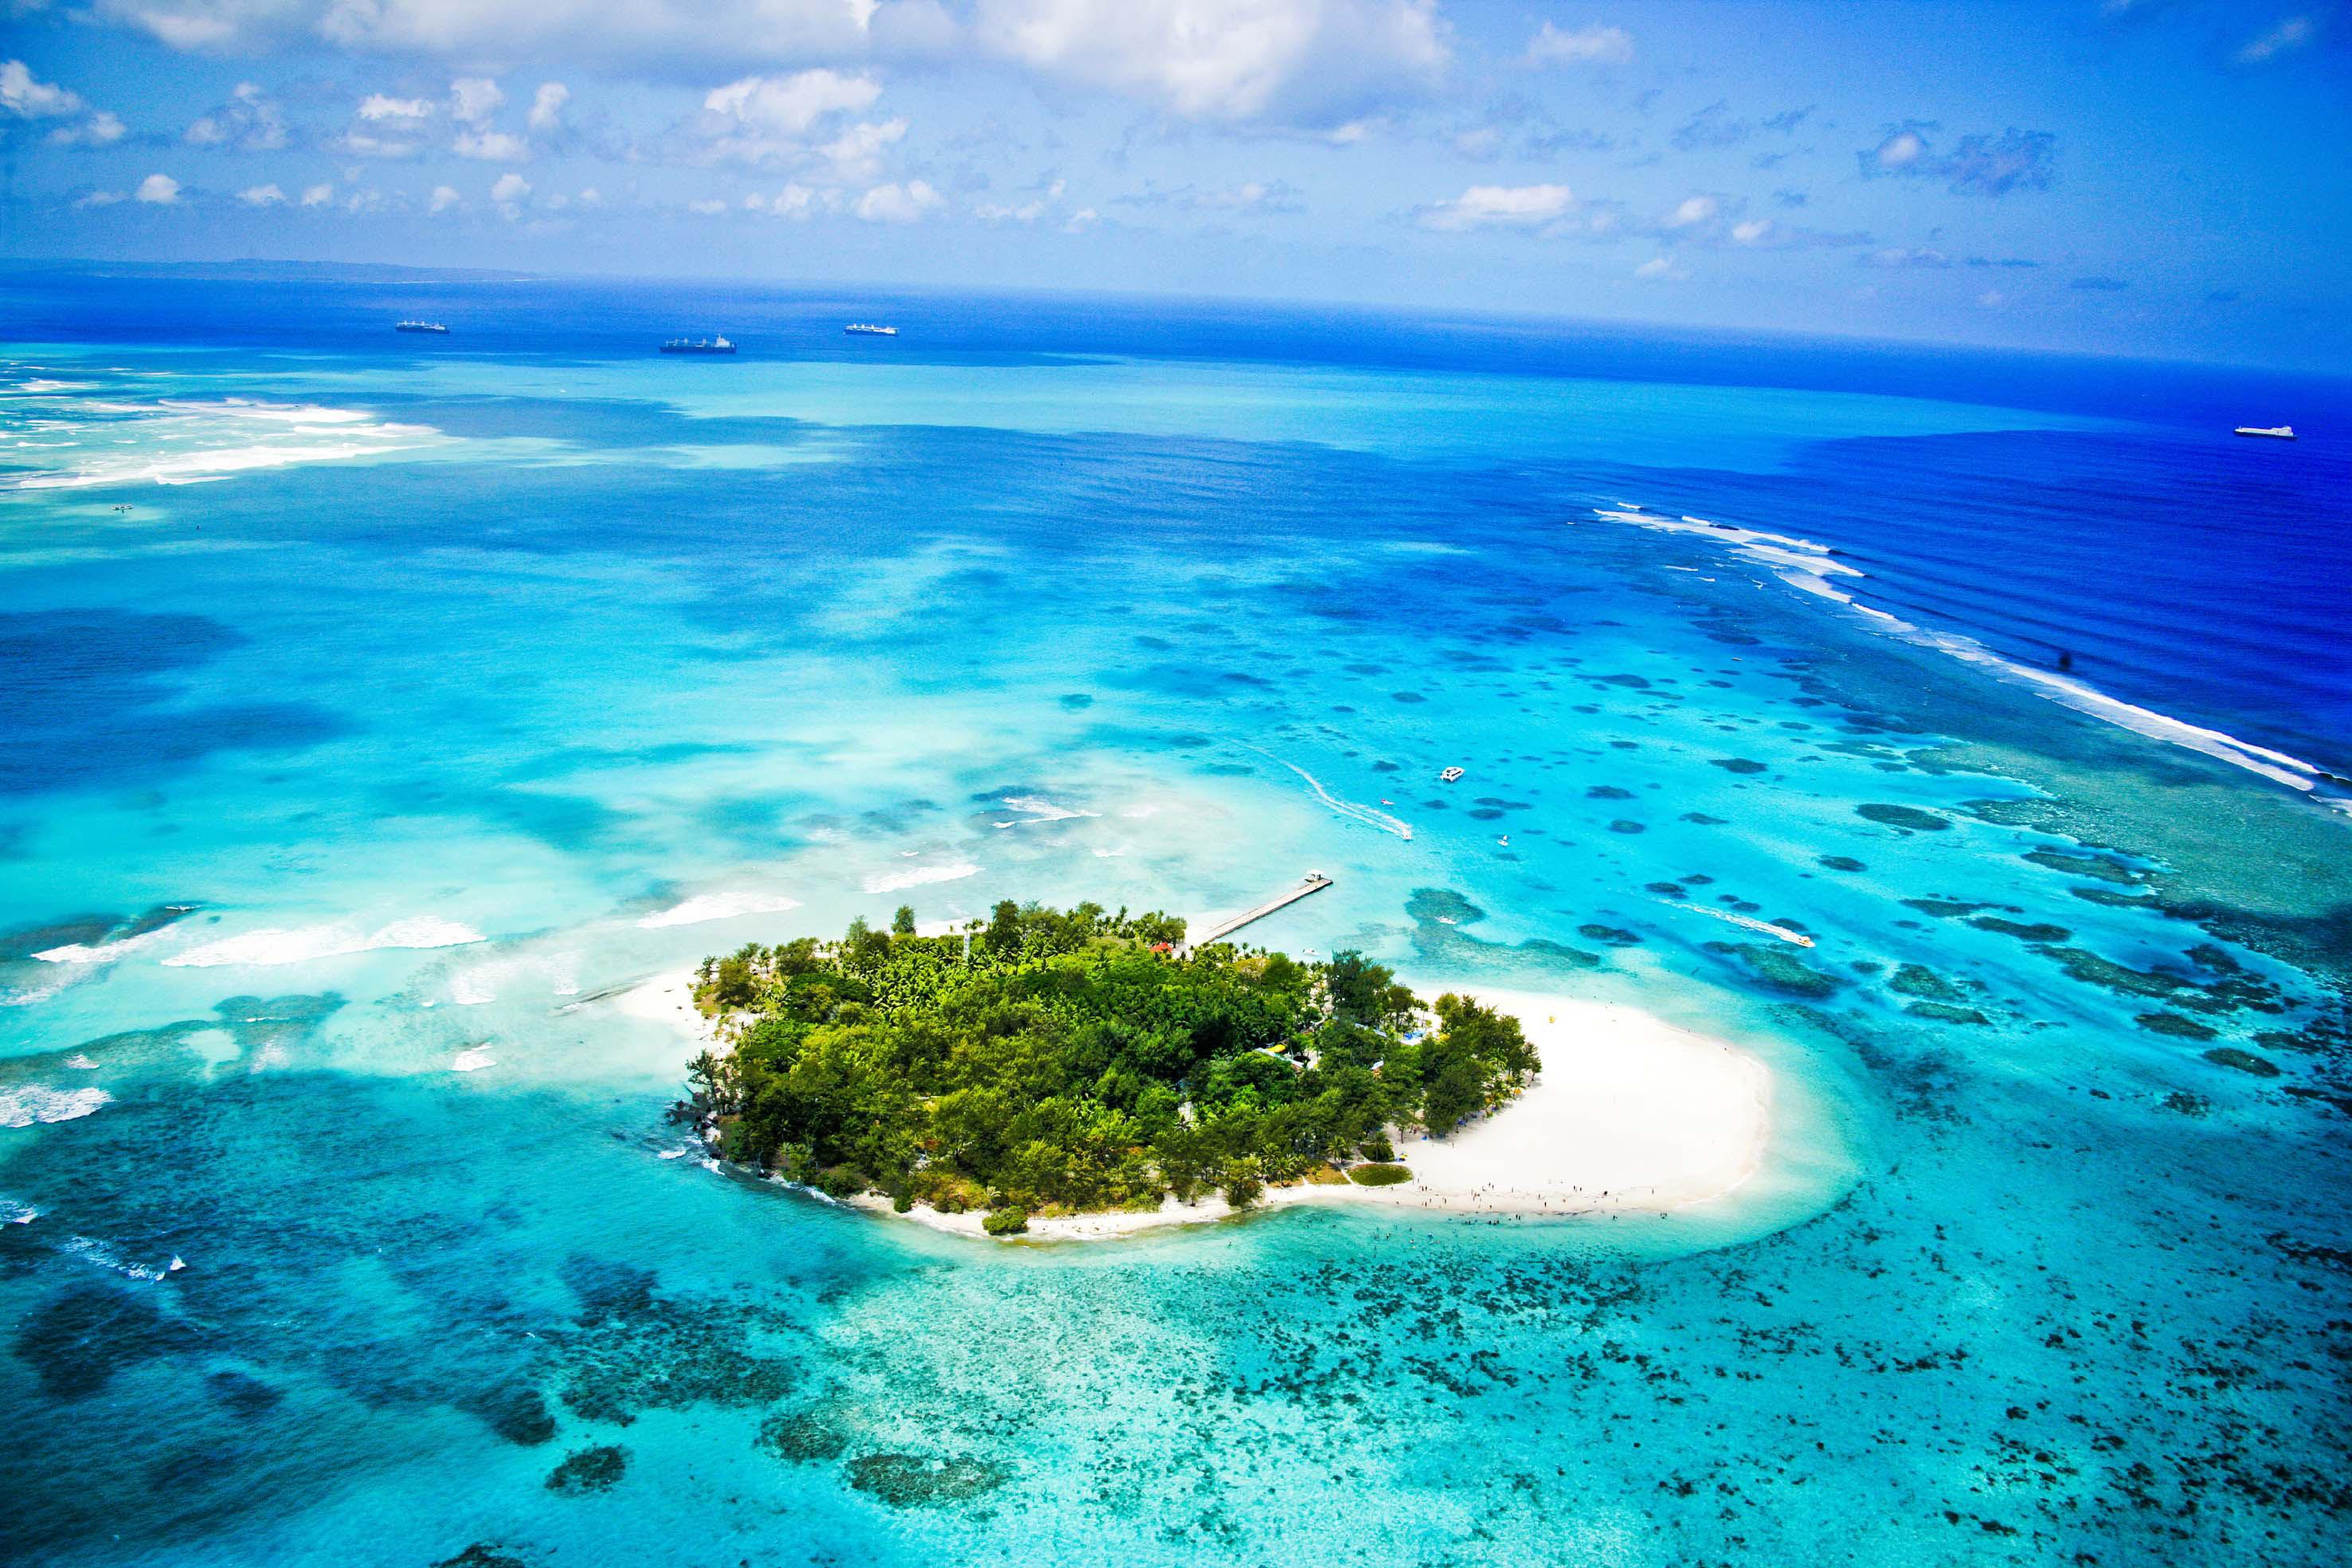 FltGraph Awesome Itinerary 44. 관광과 휴양 두마리 토끼 모두 잡는 괌, 타이페이 여행